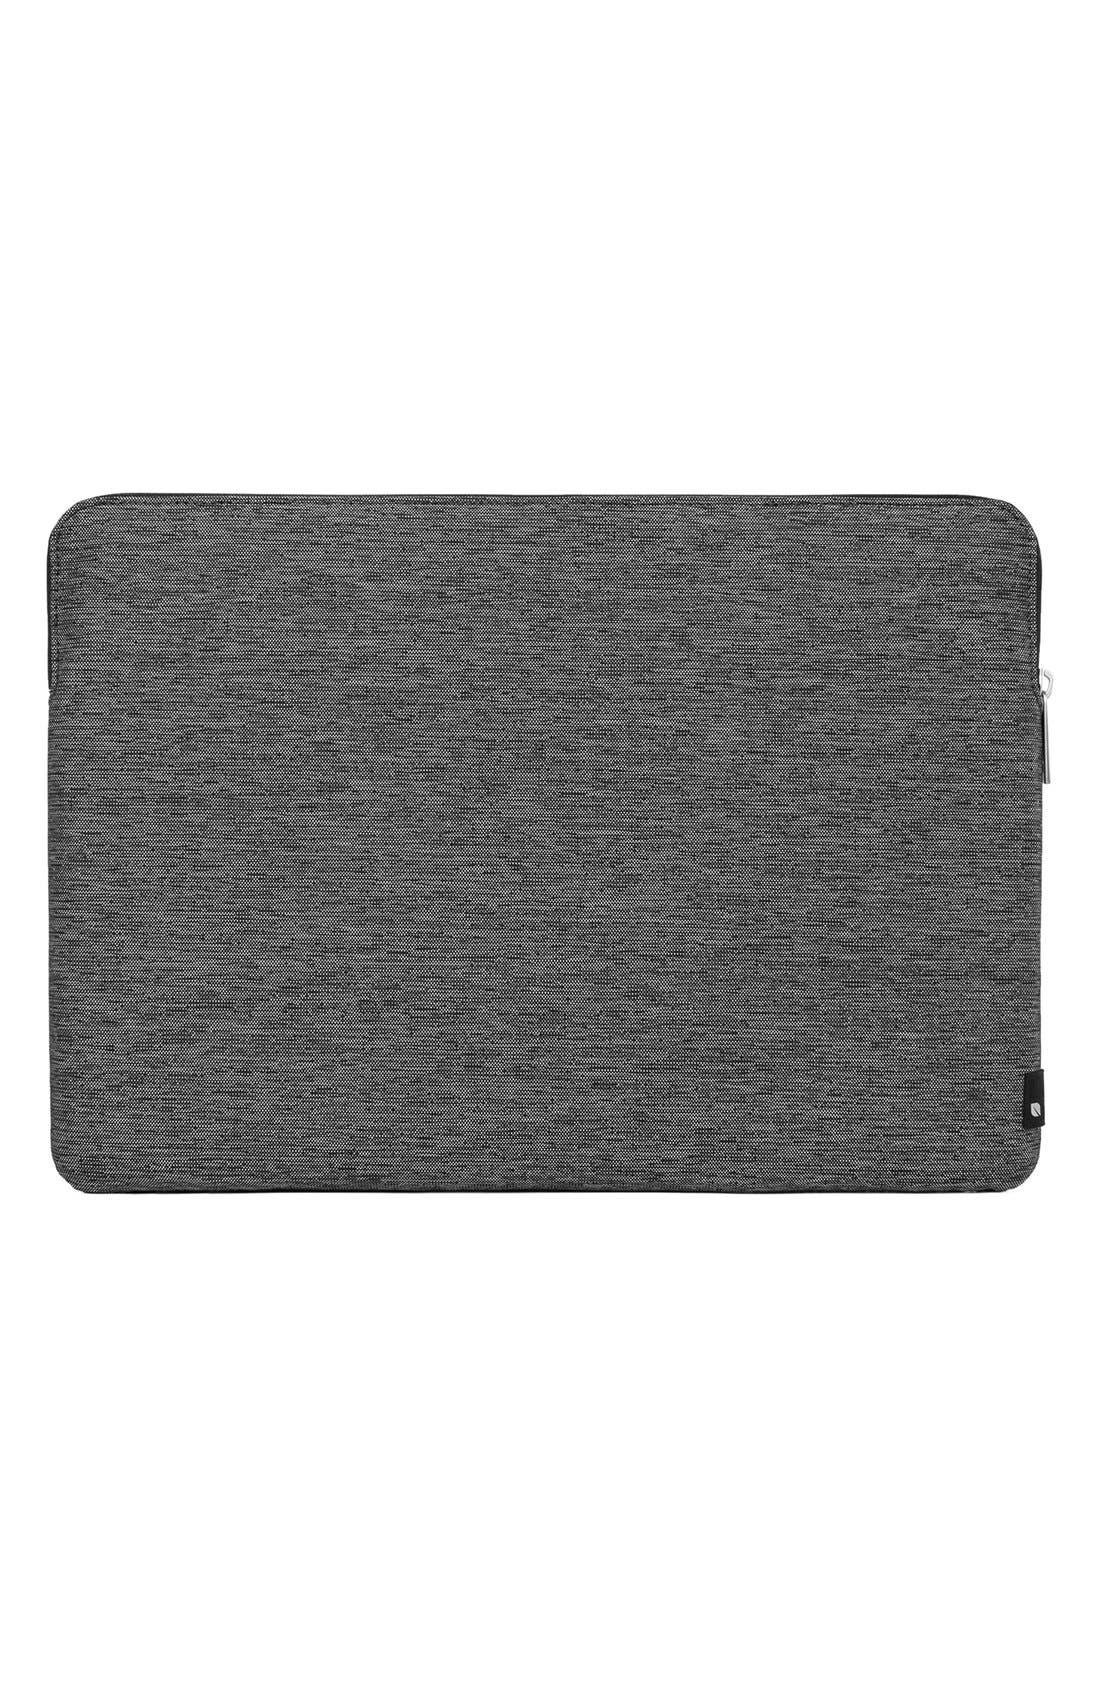 MacBook Air Sleeve,                             Alternate thumbnail 2, color,                             HEATHER  BLACK